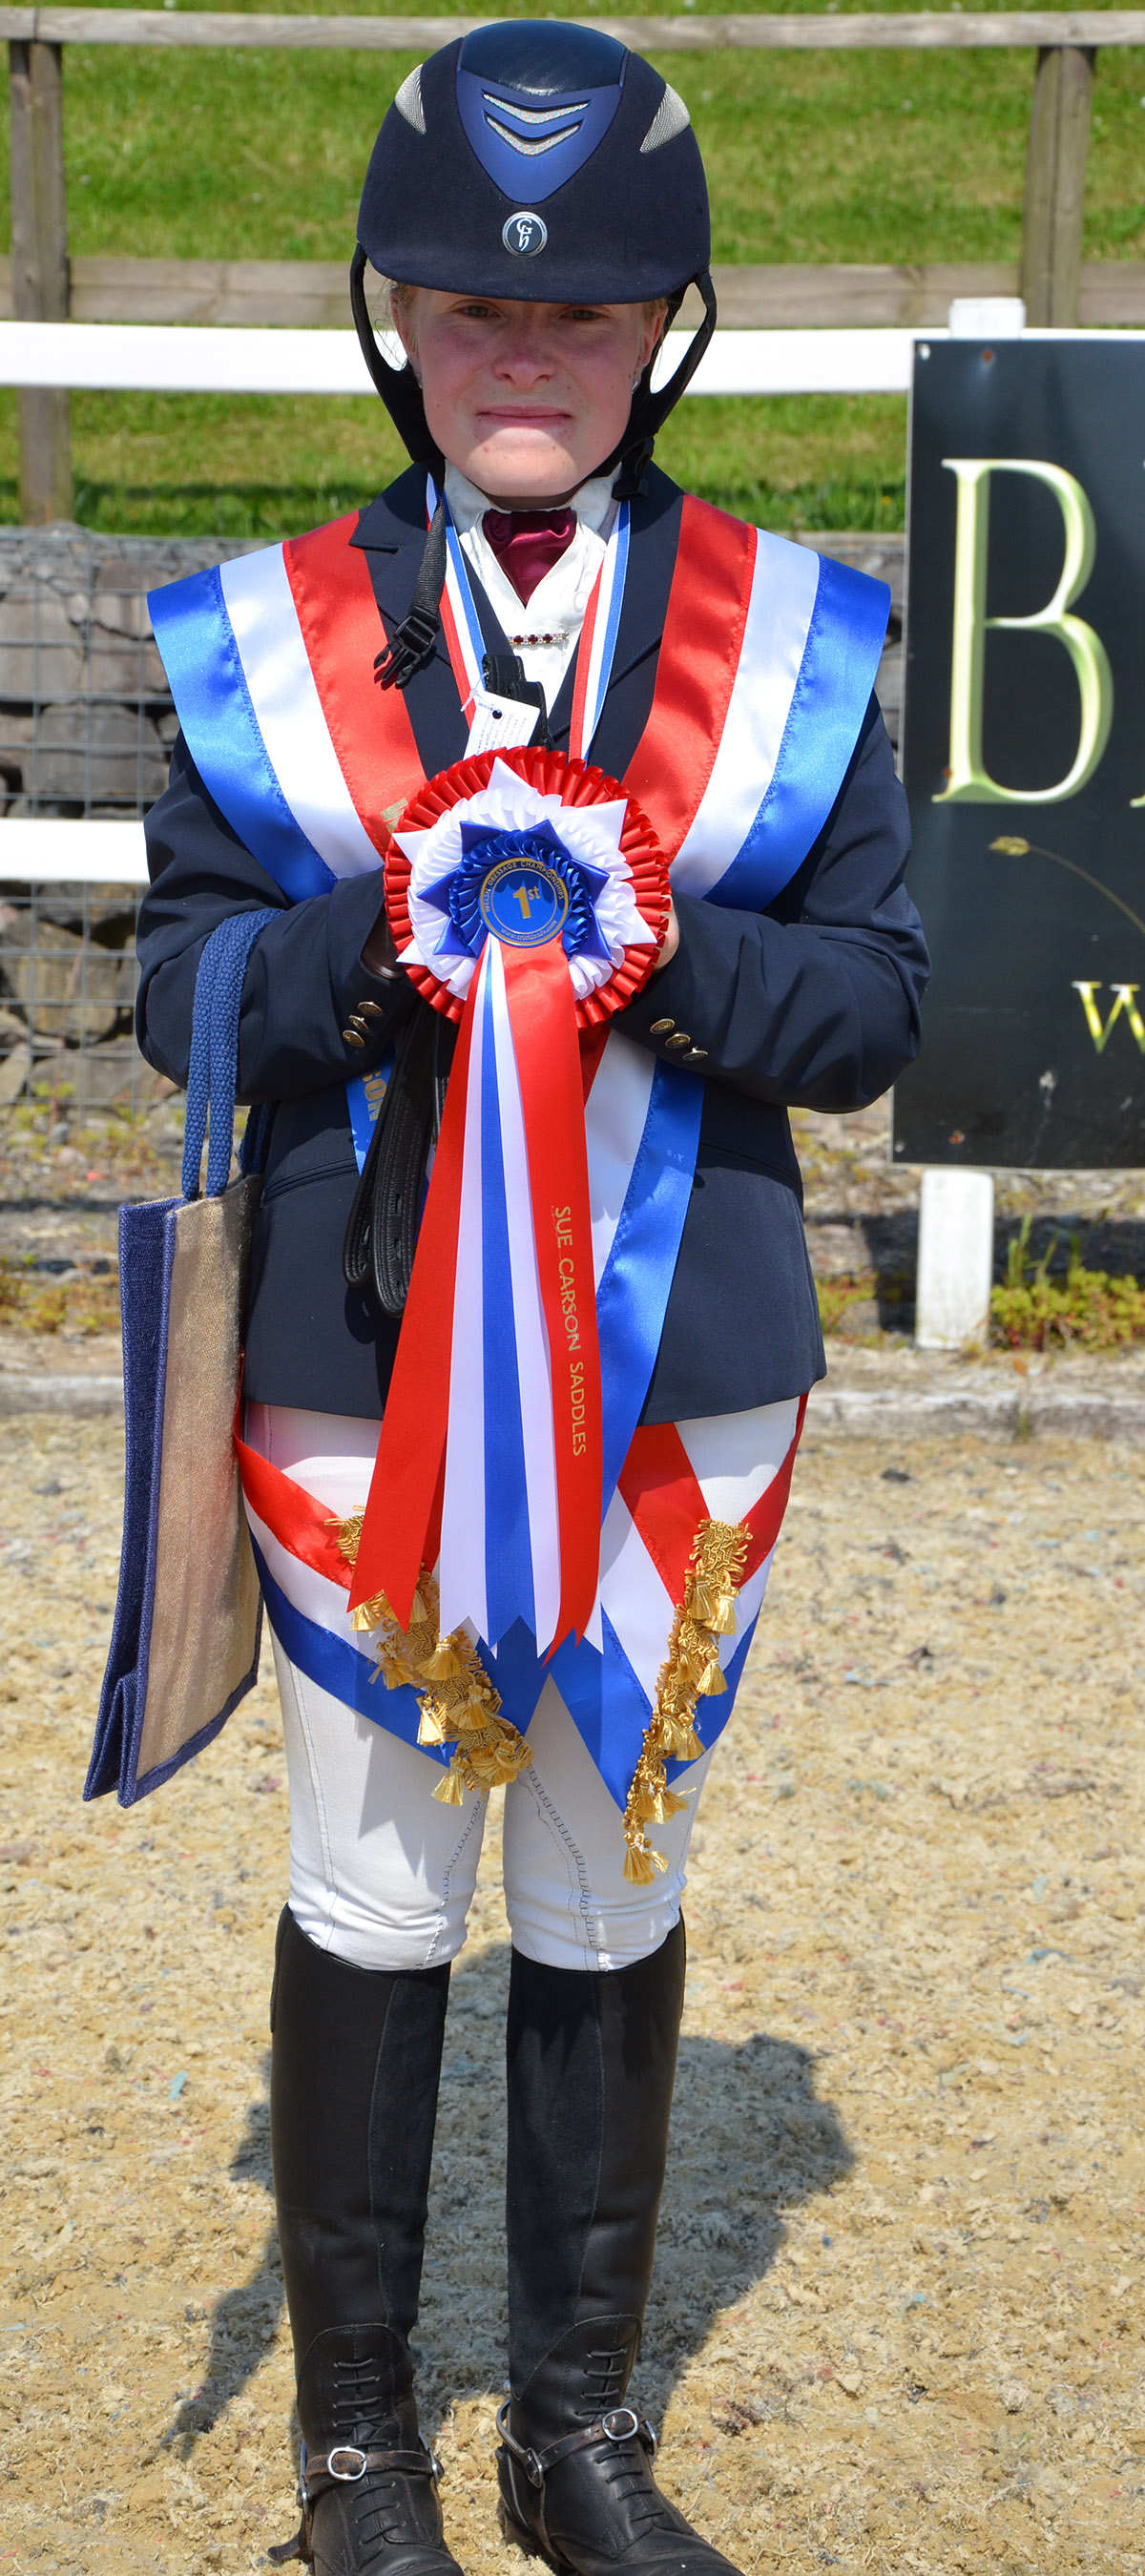 Welsh Dressage Championship - Novice Gold Medalist and Highest Placed BYRD 2016